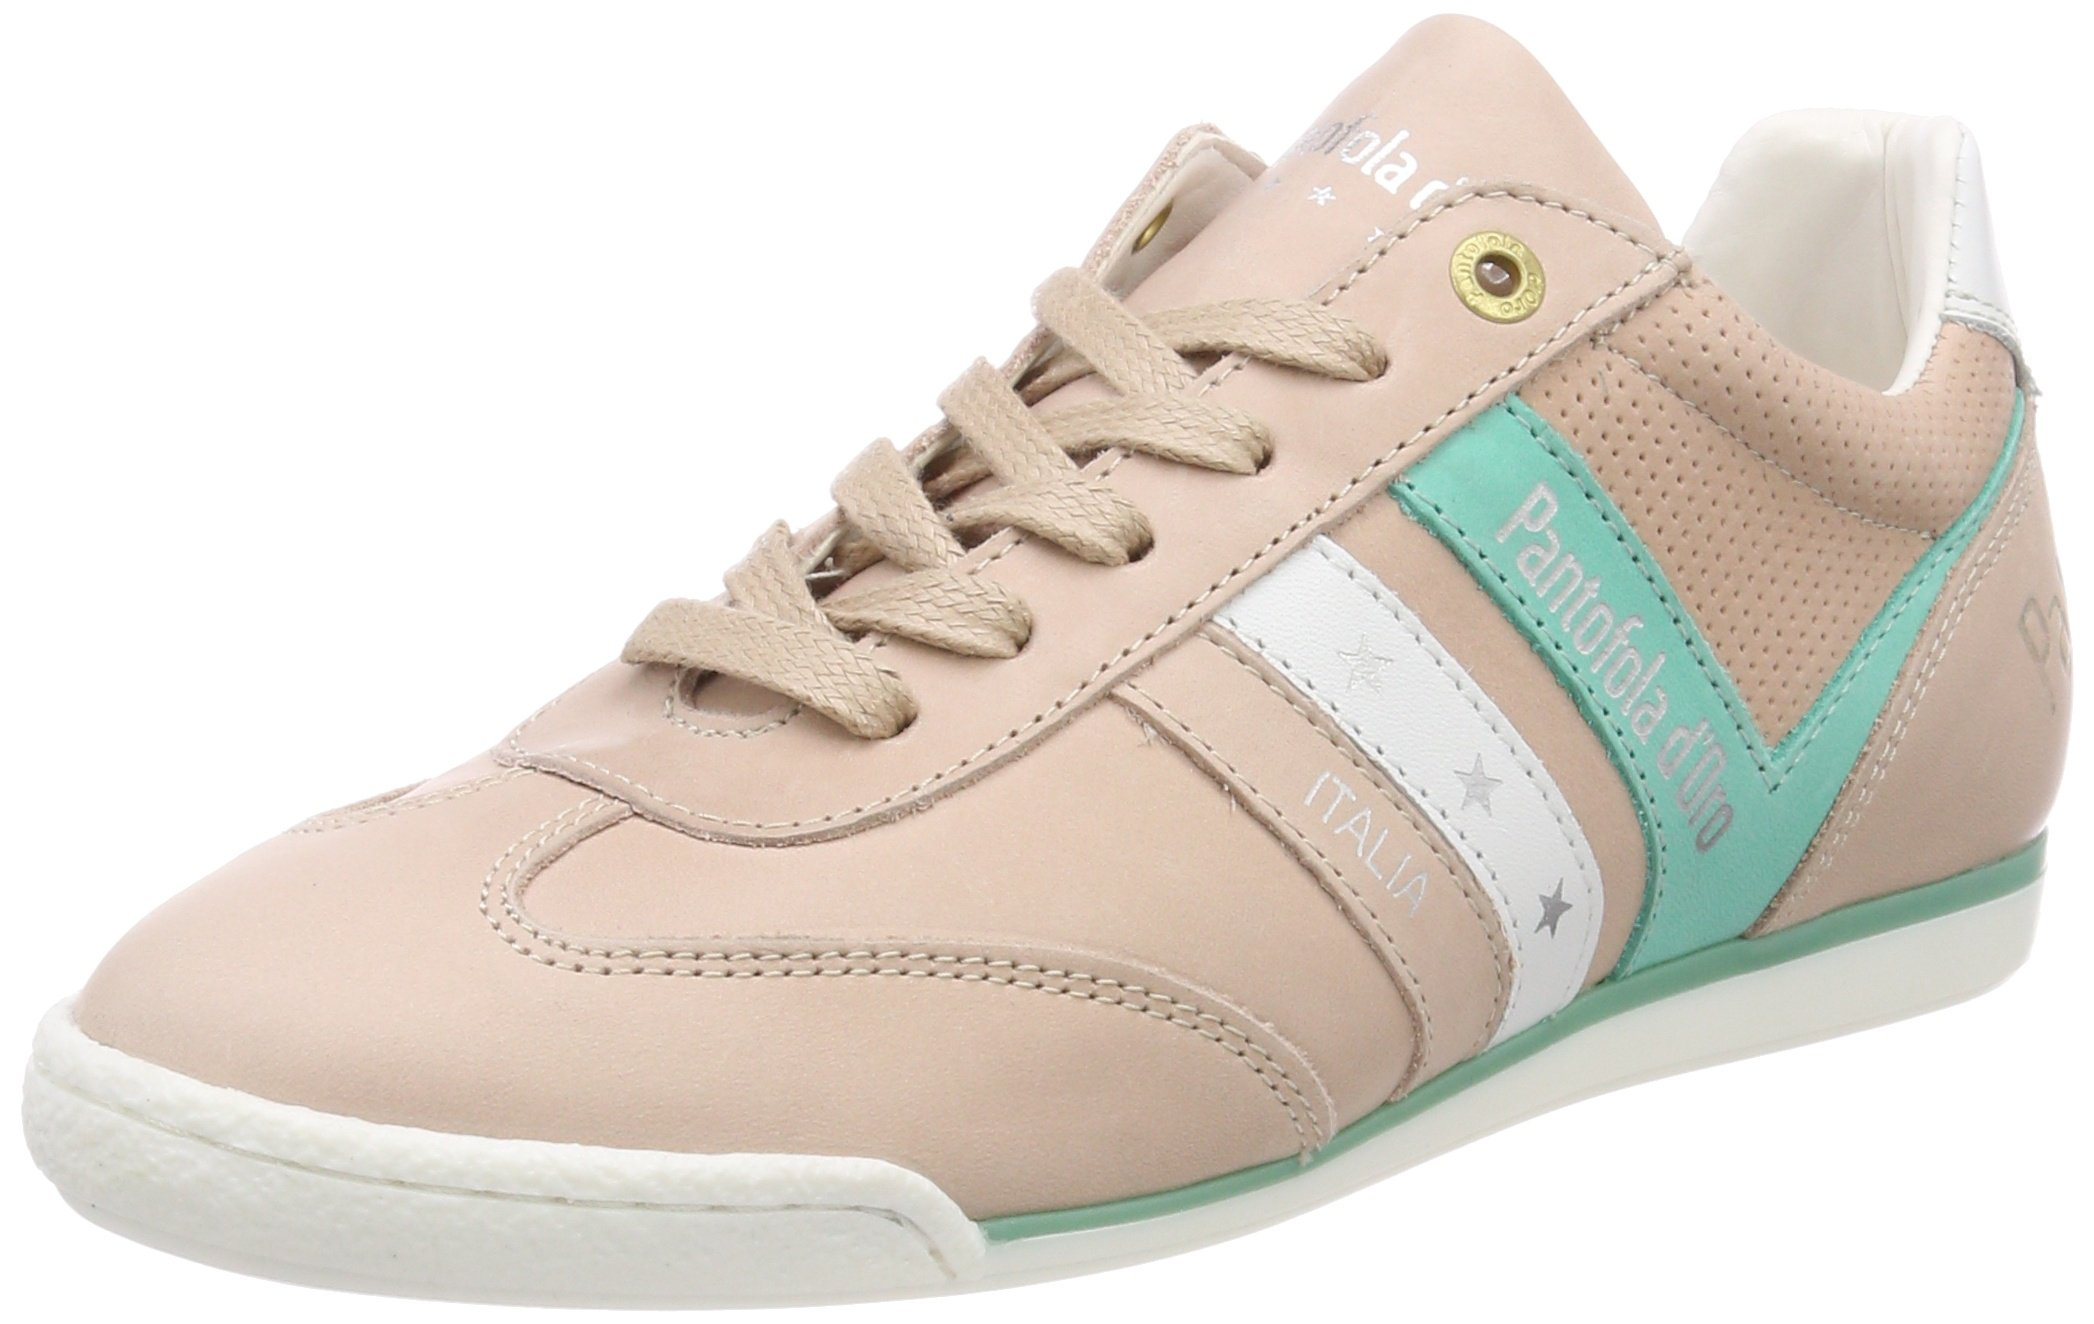 Pantofola D'oro FemmePinknude38 LowBaskets Vasto Donne Eu wPkX8ON0Zn